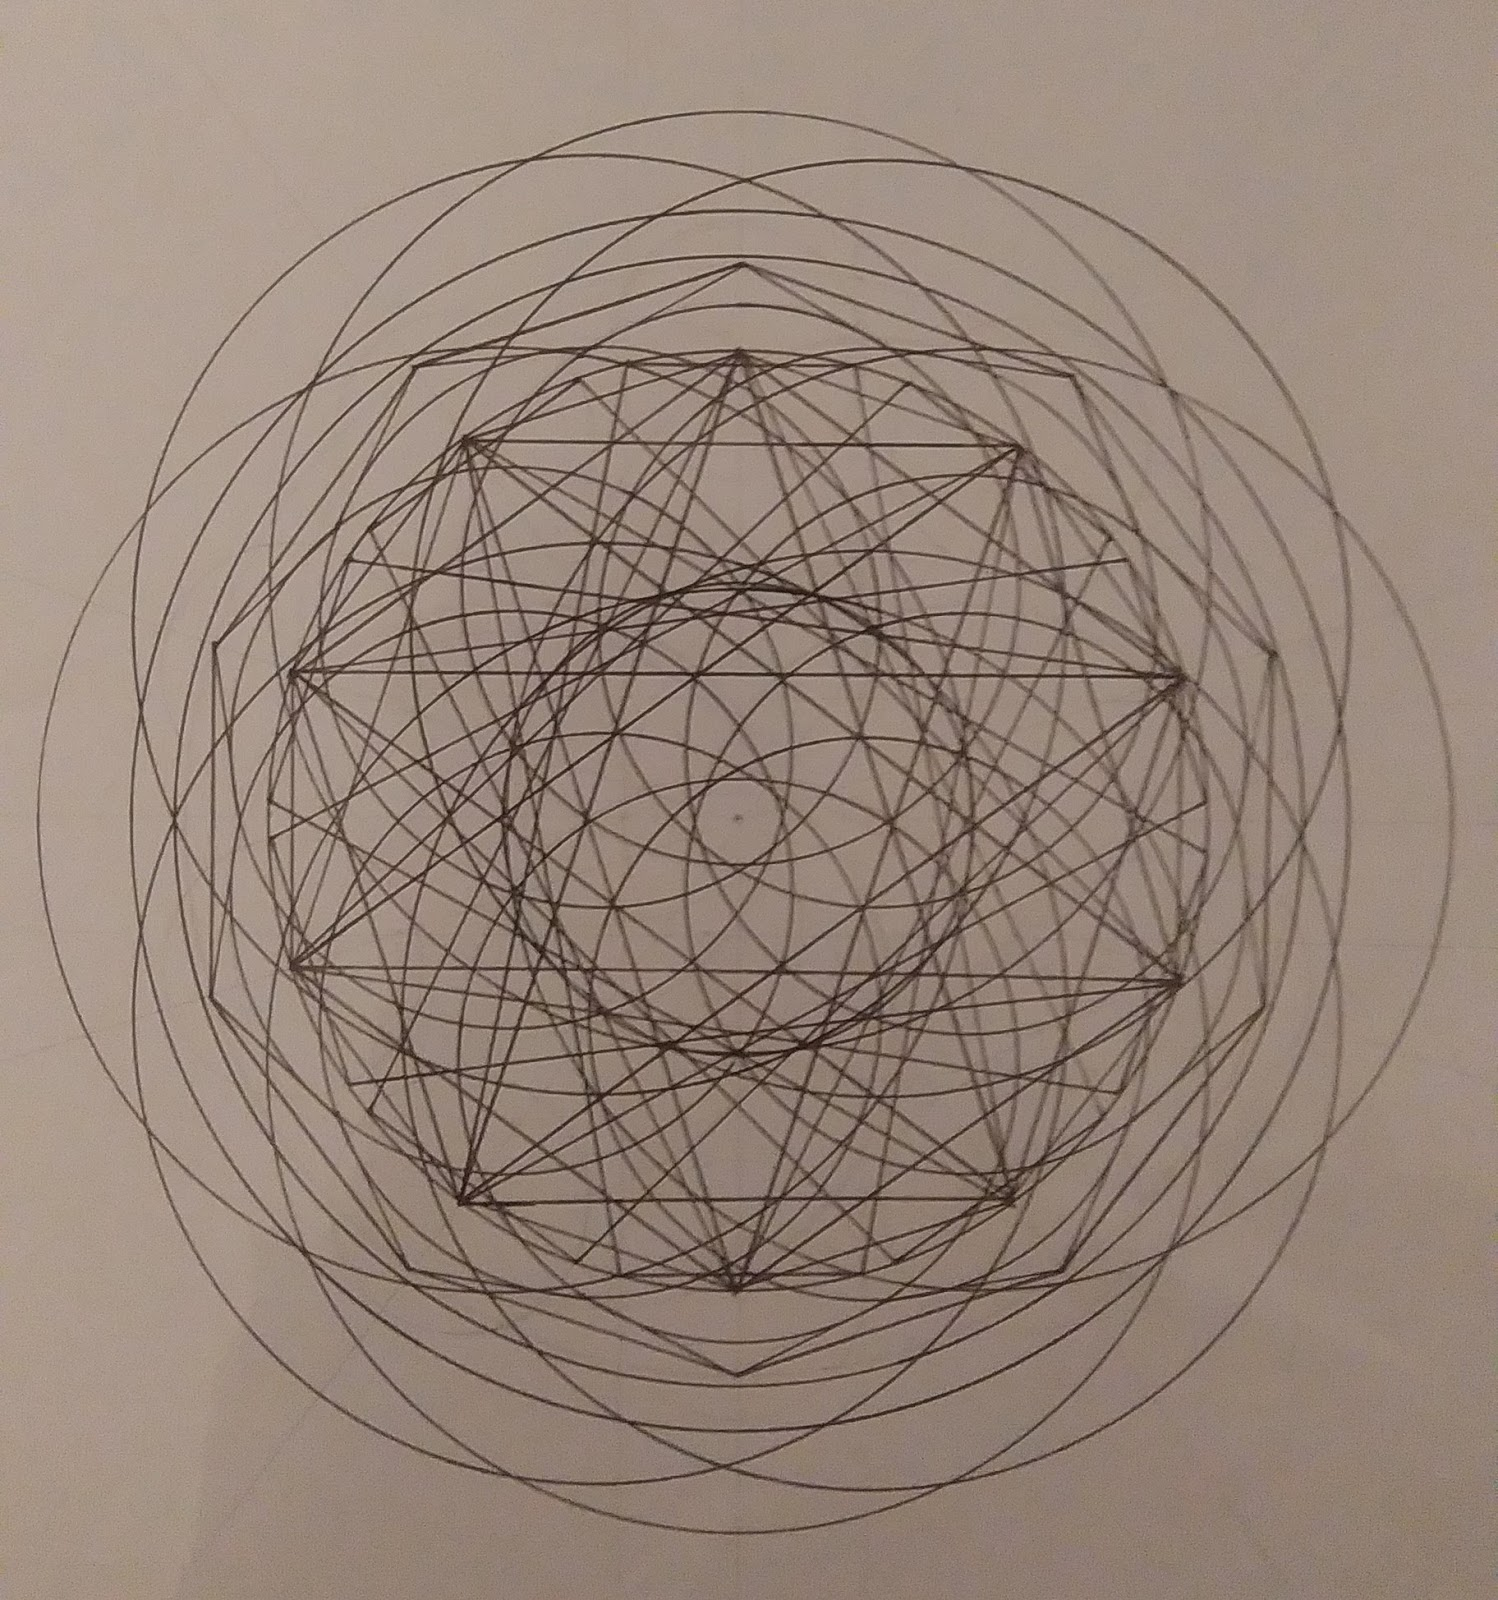 [SPOLYK] - Geometries & sketches - Page 6 47308701_1103195436533806_9116842605802422272_o